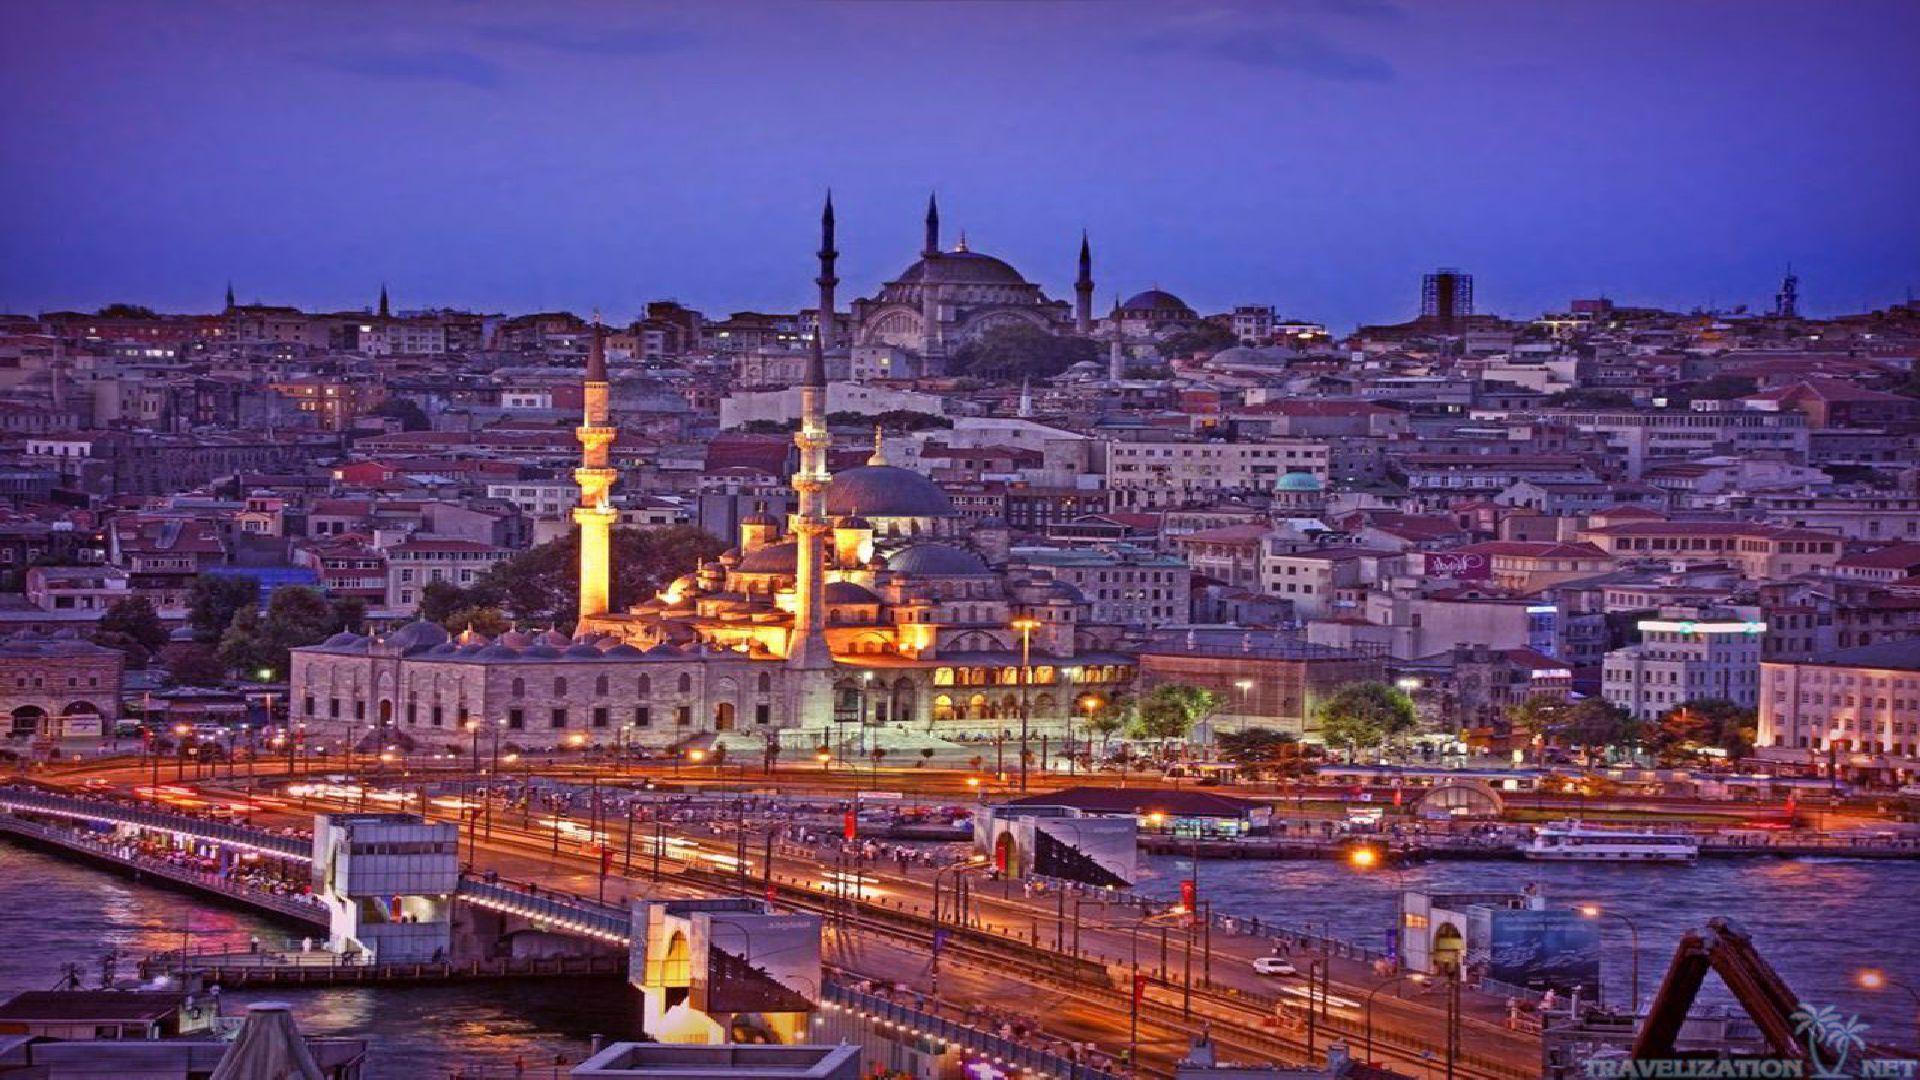 Imagenes Hd 1080p: Full HD 1080p Istanbul Wallpapers HD, Desktop Backgrounds